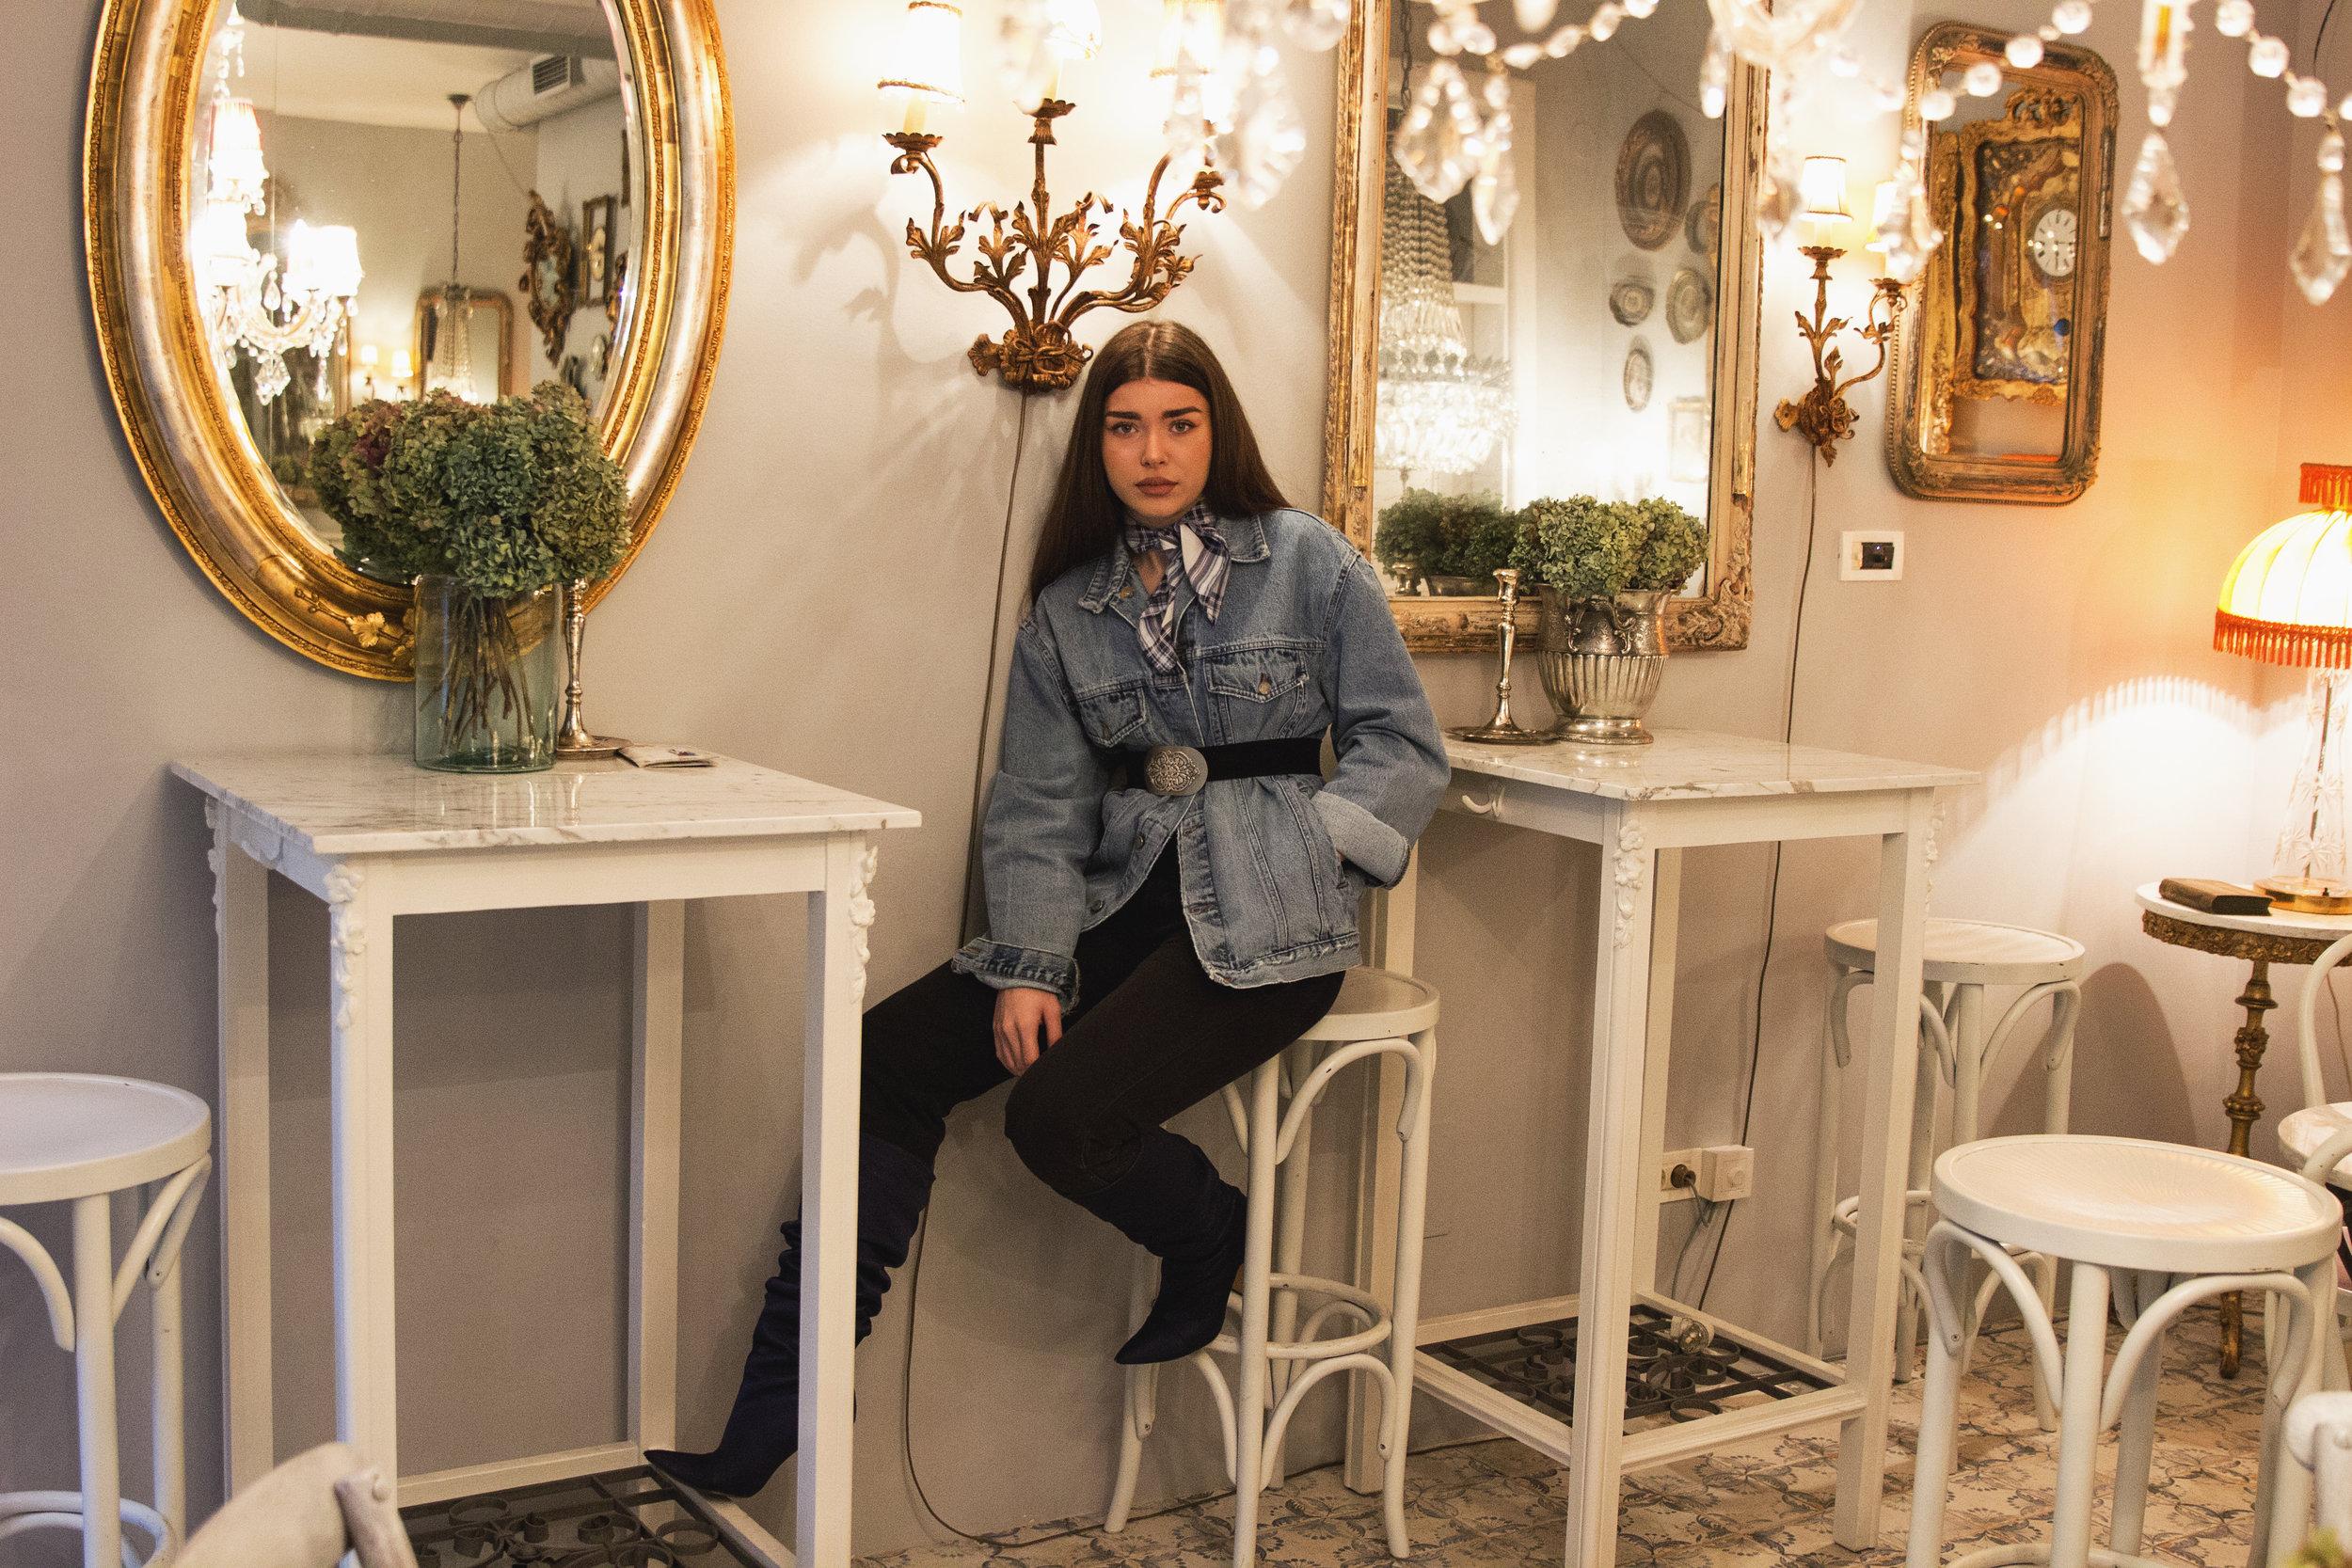 fashion-editorial-robert-sever-caffe-bar-finjak-expensive-reality-fashion-photography (4).jpg